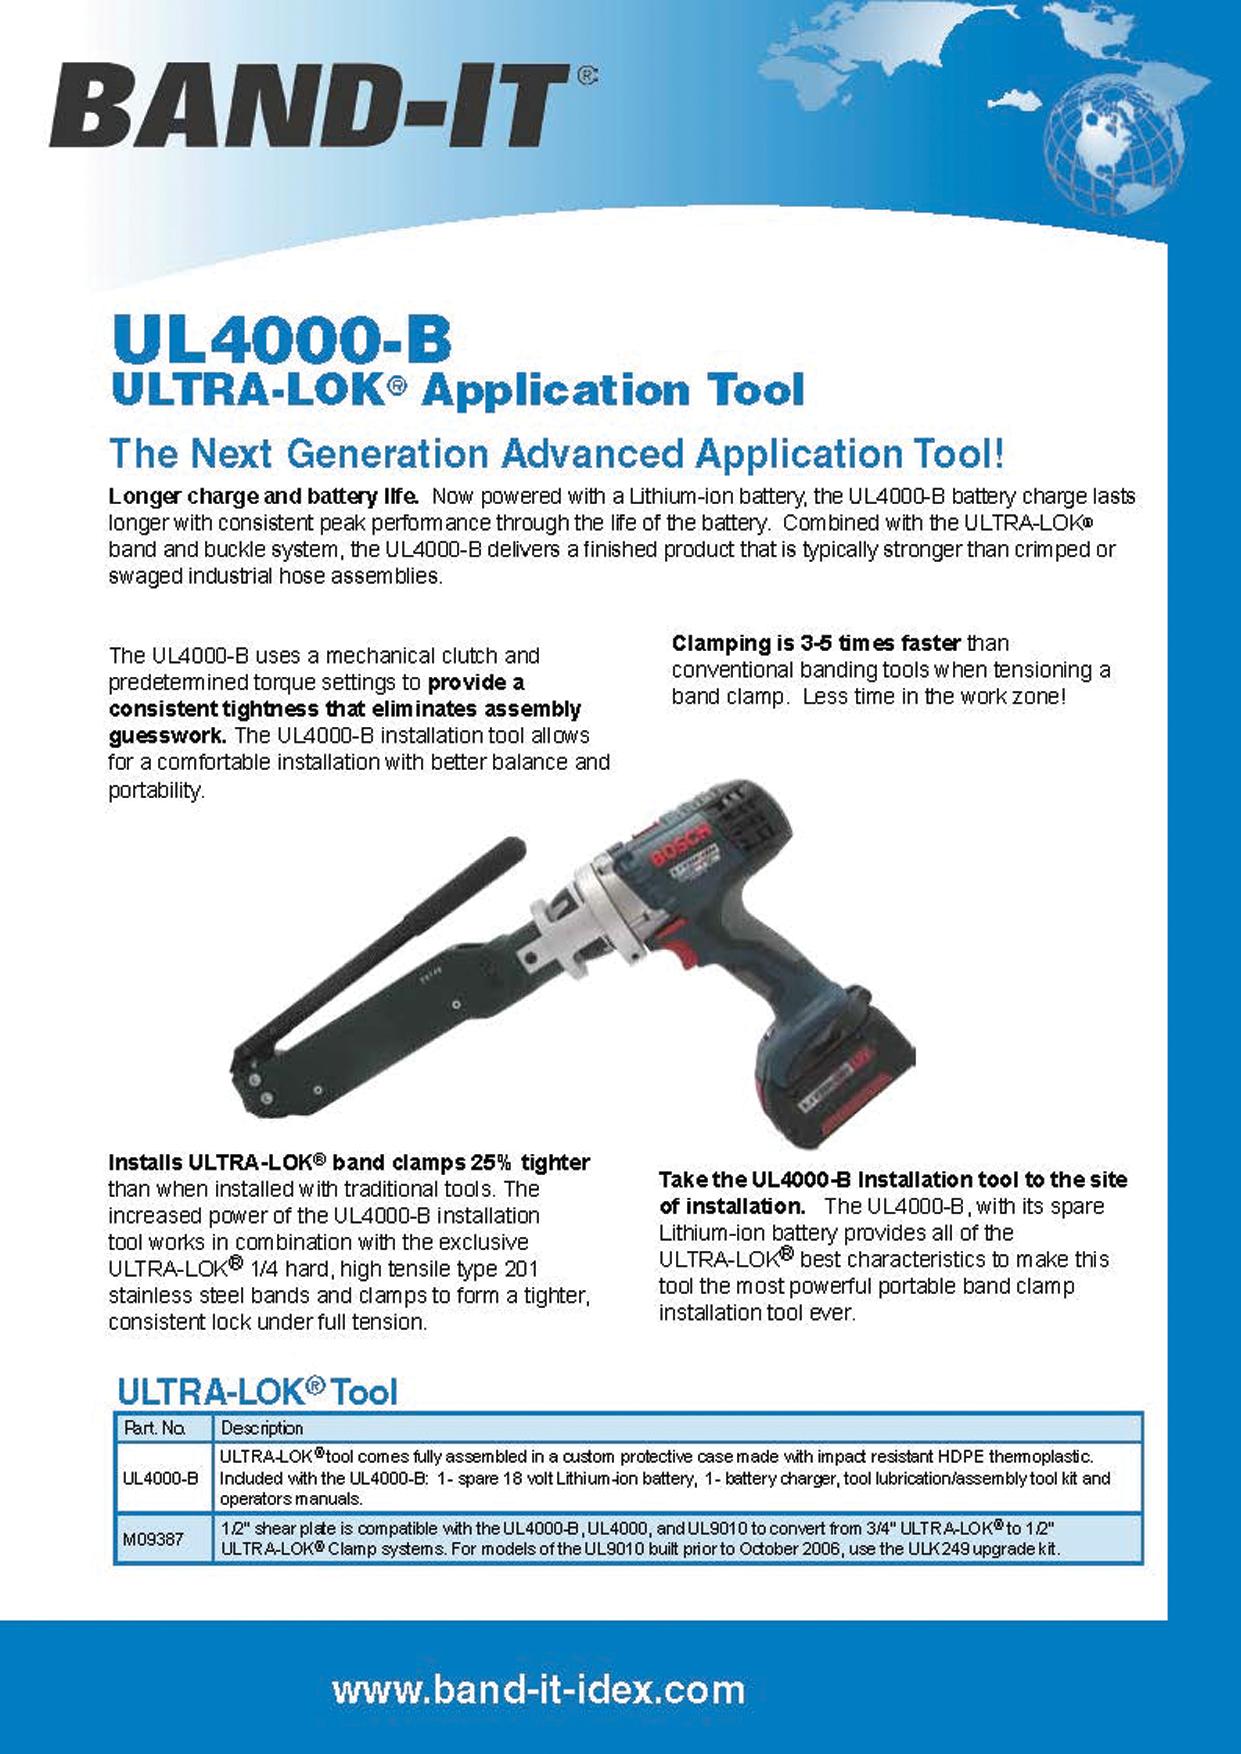 UL4000-B Ultra-Lok Application Tool